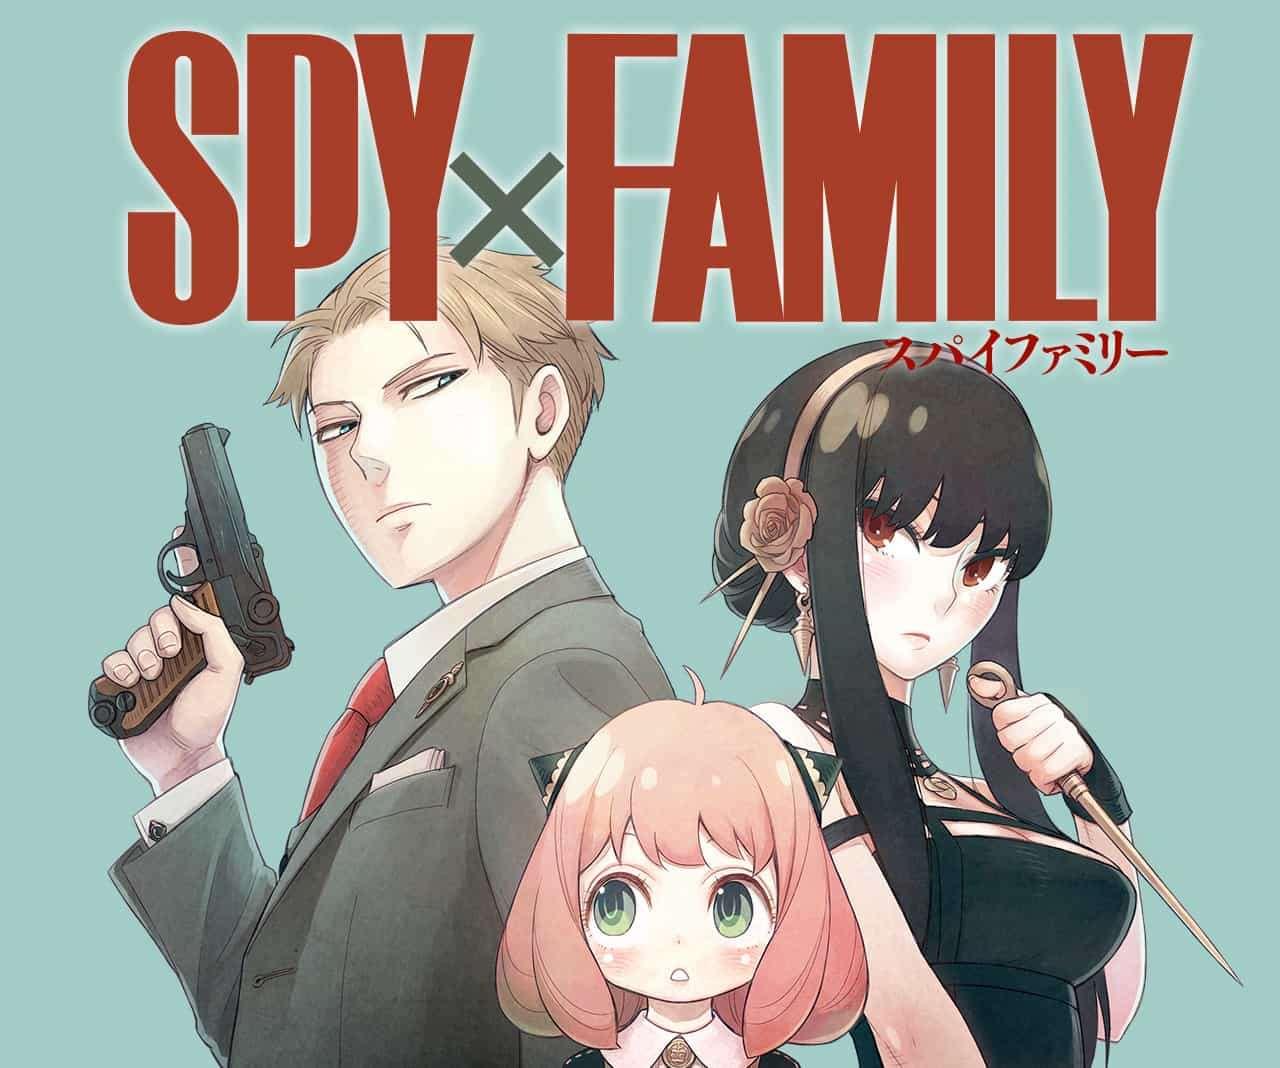 SPY x FAMILY